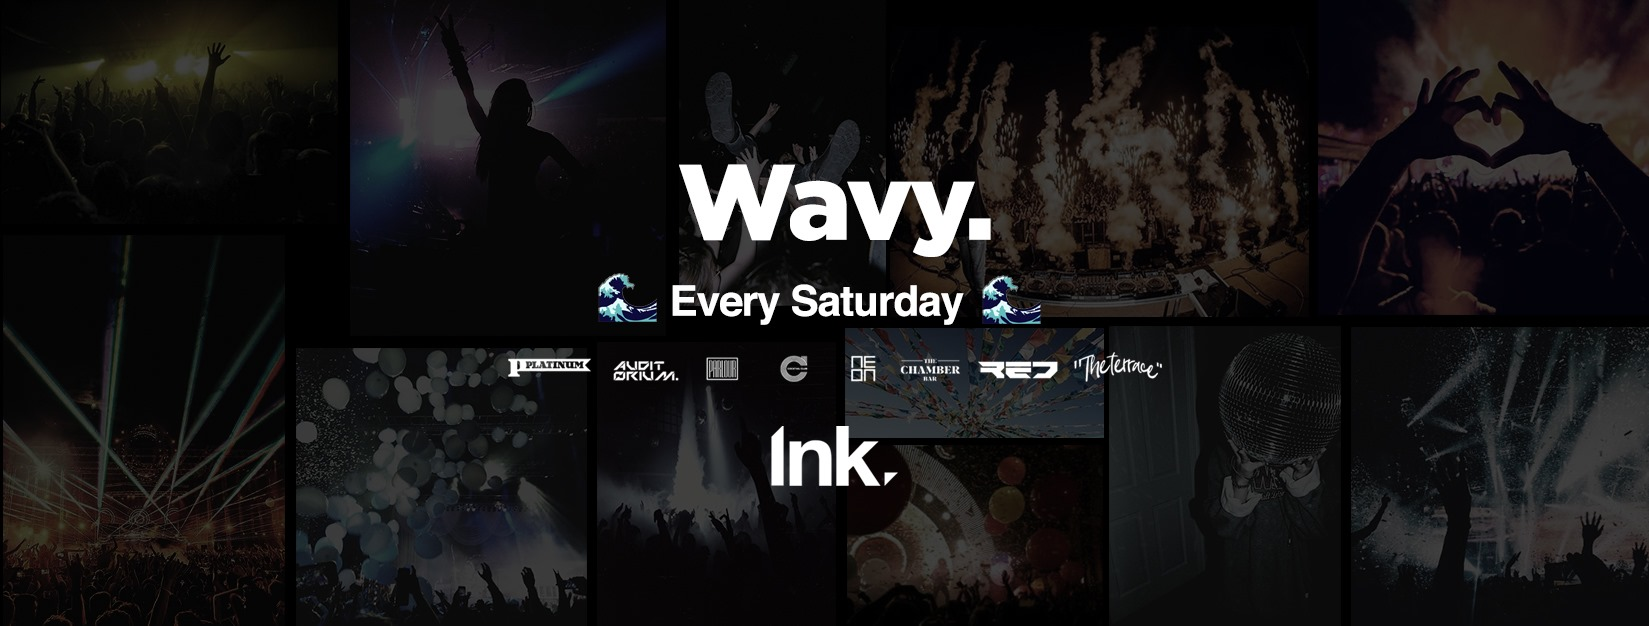 Wavy Saturdays – Every Saturday